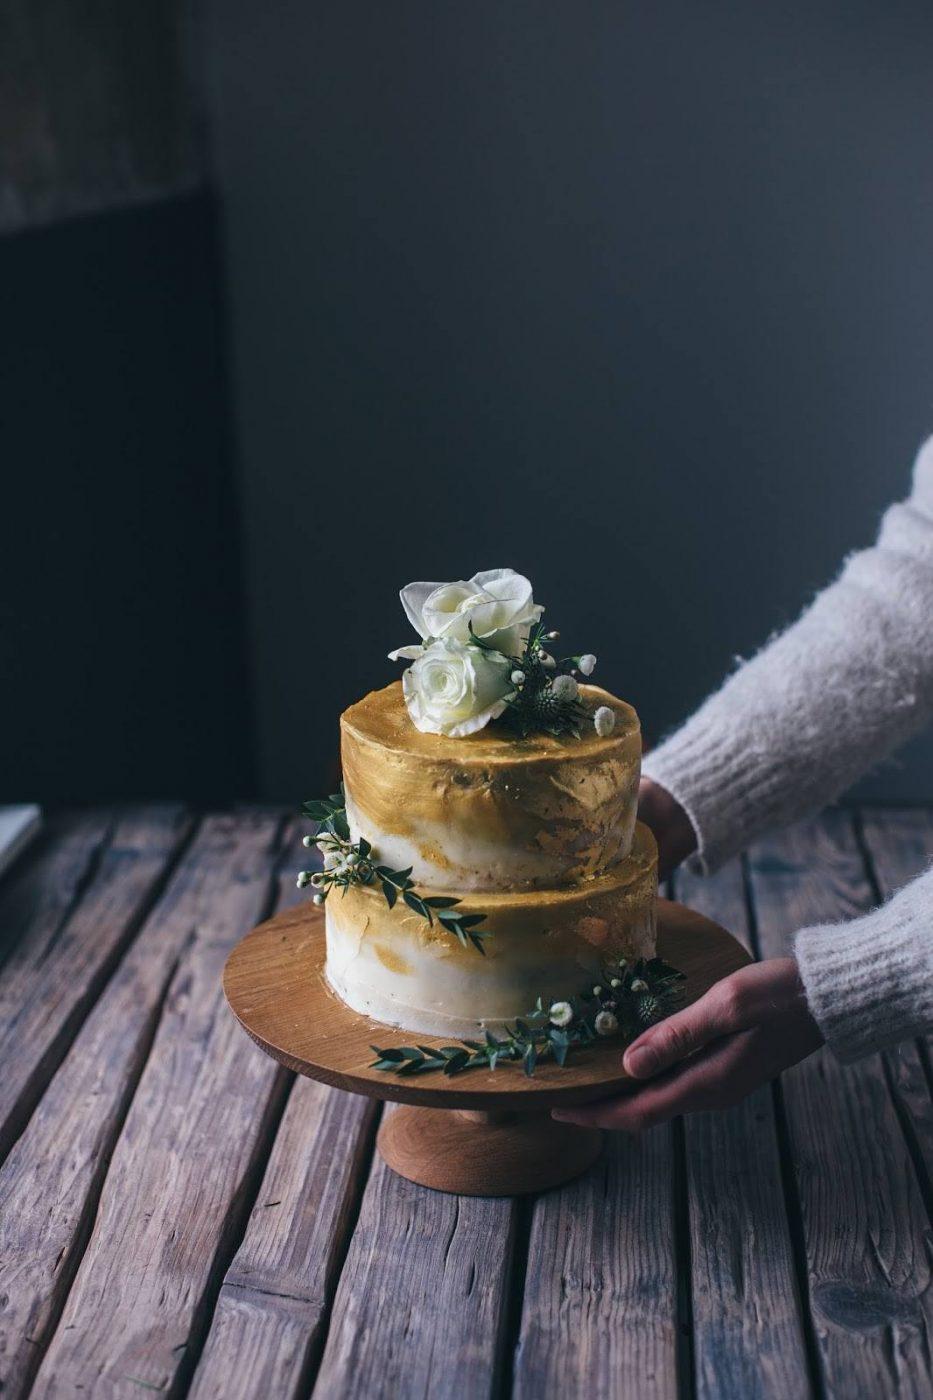 Image for Golden Coconut-Raspberry-Rose-Cake – a gluten-free Wedding Cake